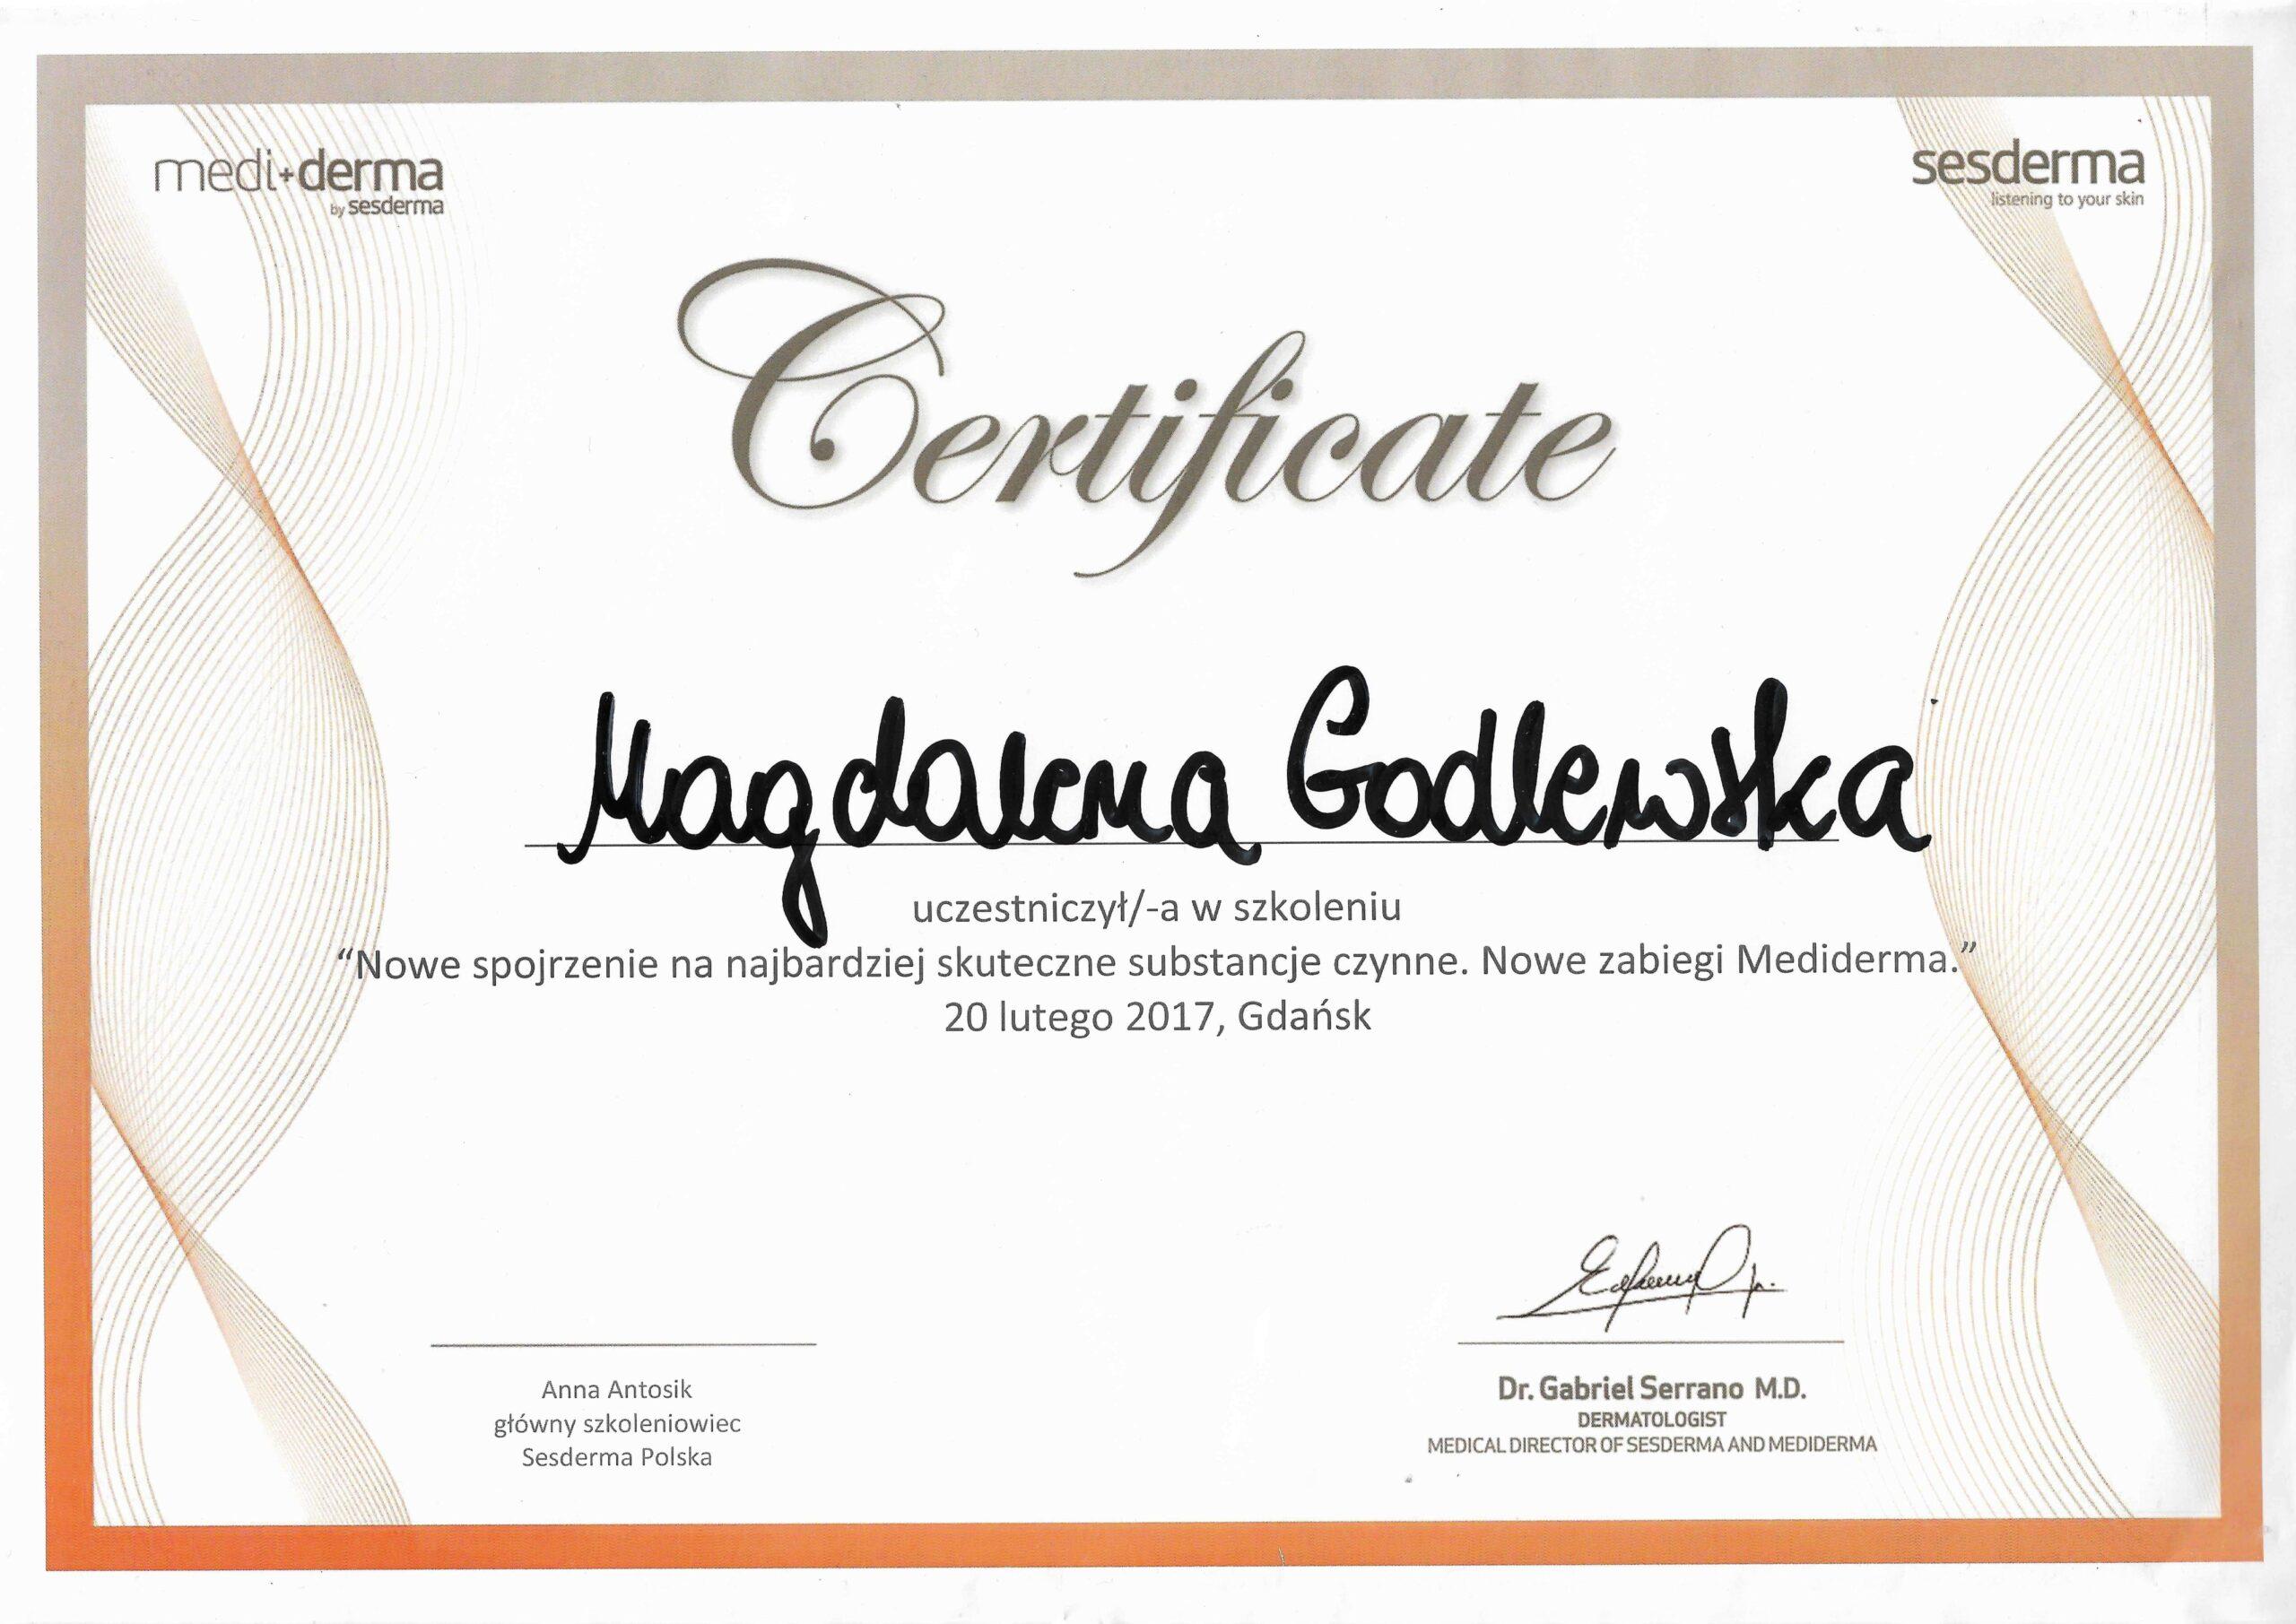 Medi_derma certyfikat